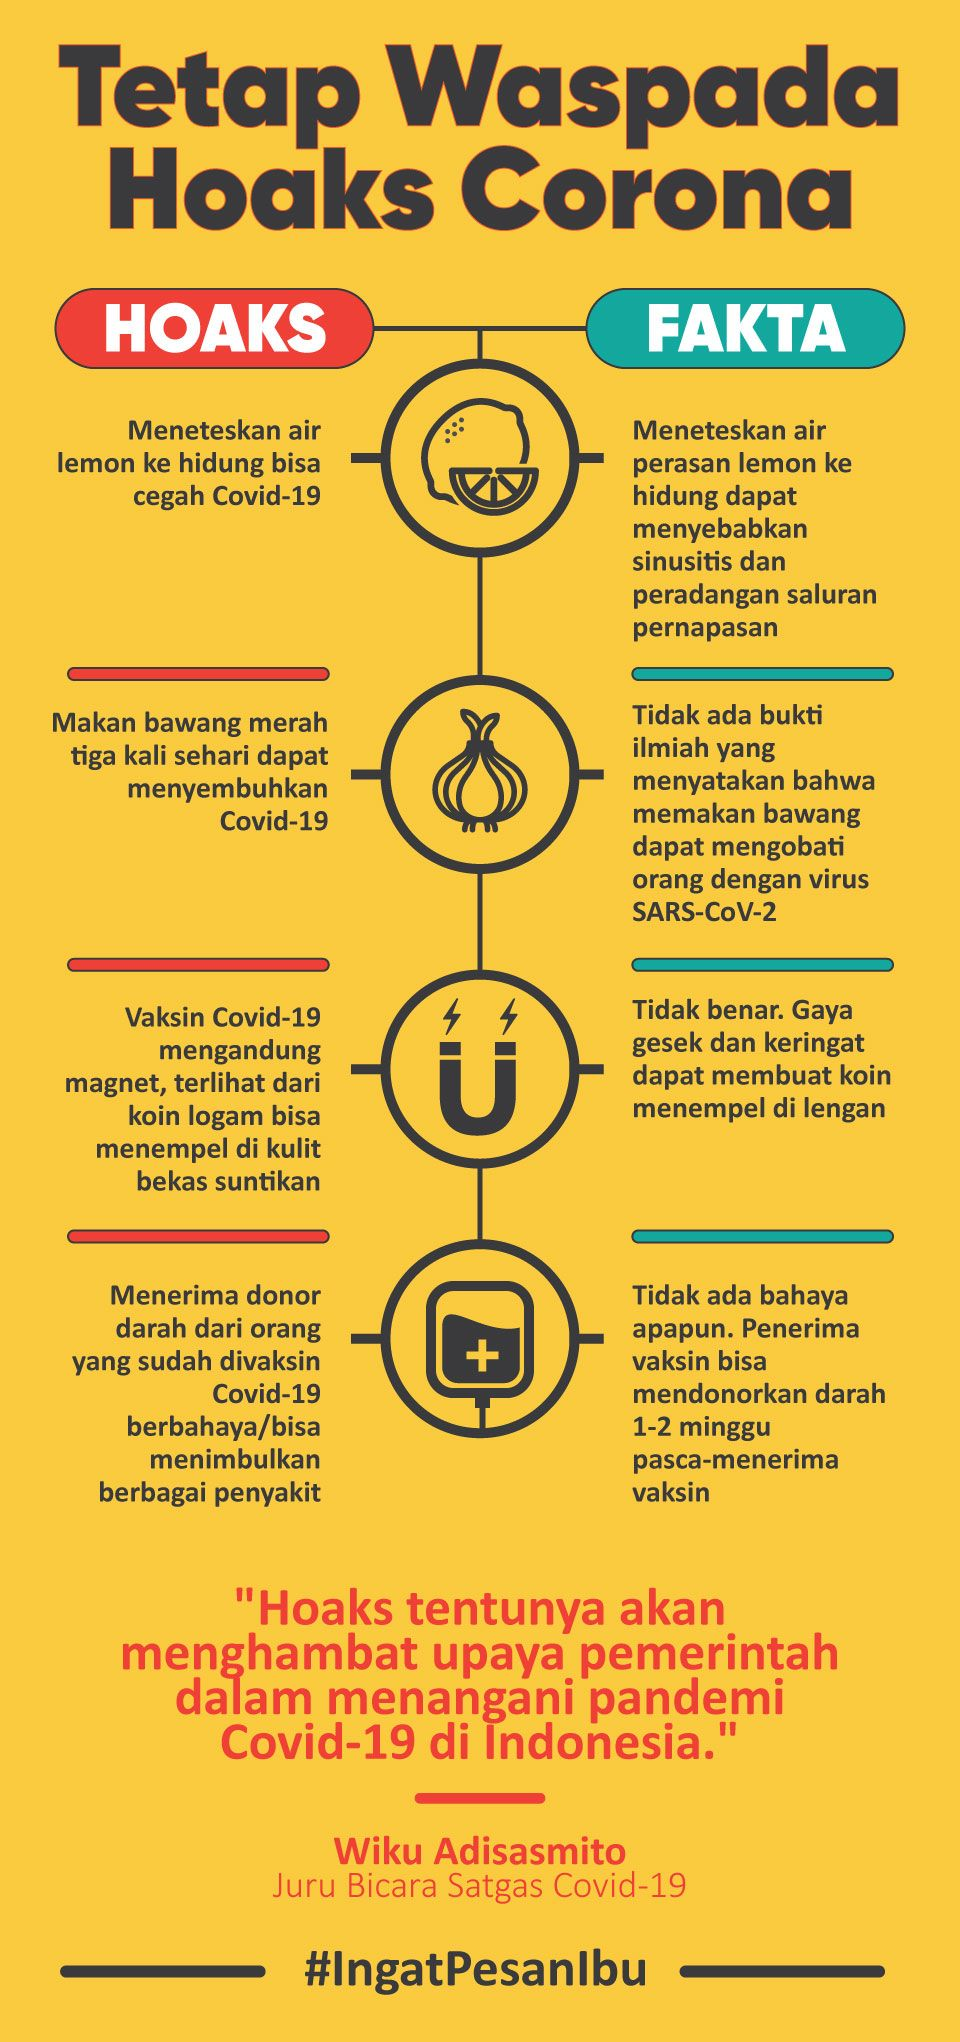 Infografis Tetap Waspada Hoaks Corona